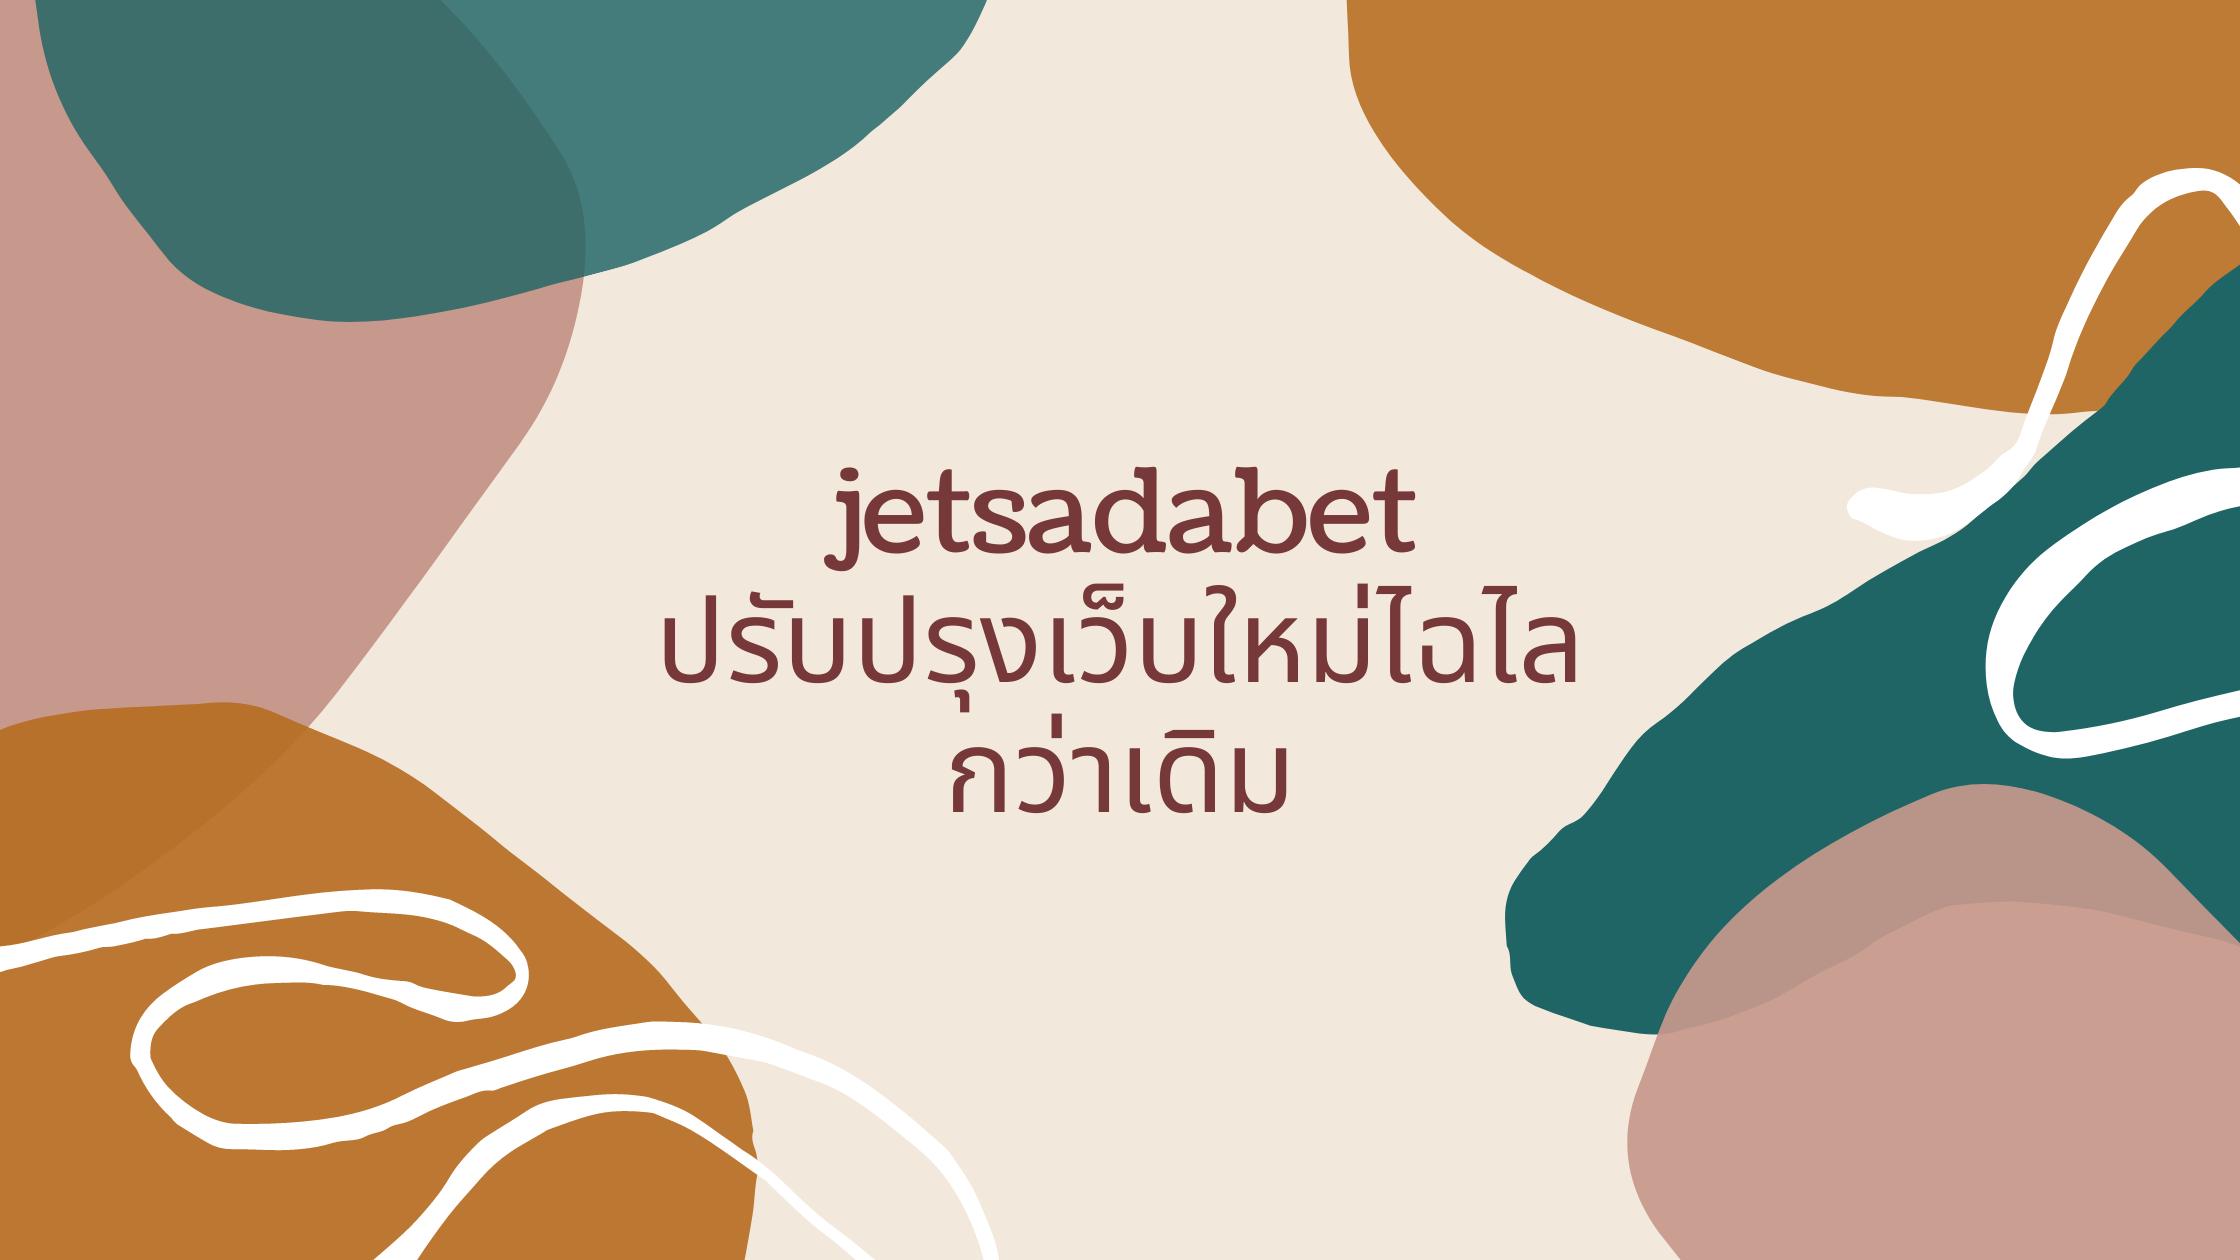 jetsadabet ปรับปรุงเว็บใหม่ไฉไลกว่าเดิม